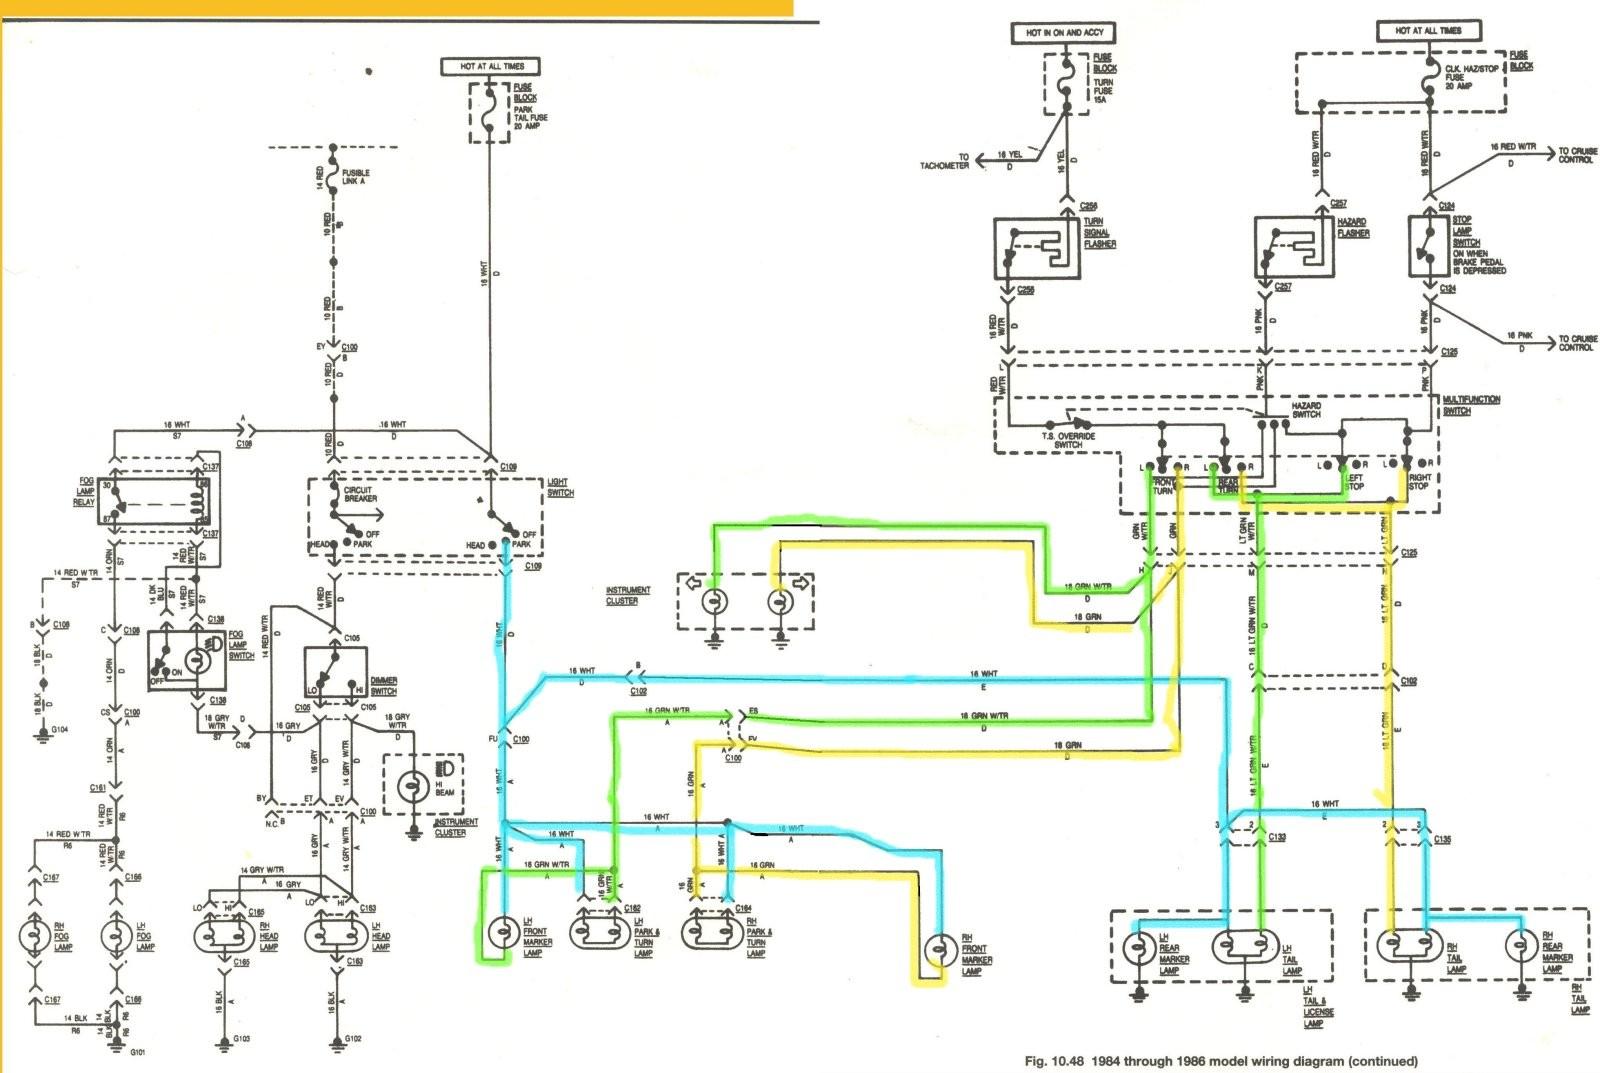 Jeep Cj7 Headlight Wiring Diagram - Wiring Diagrams Word H Headlight Wiring Diagram on